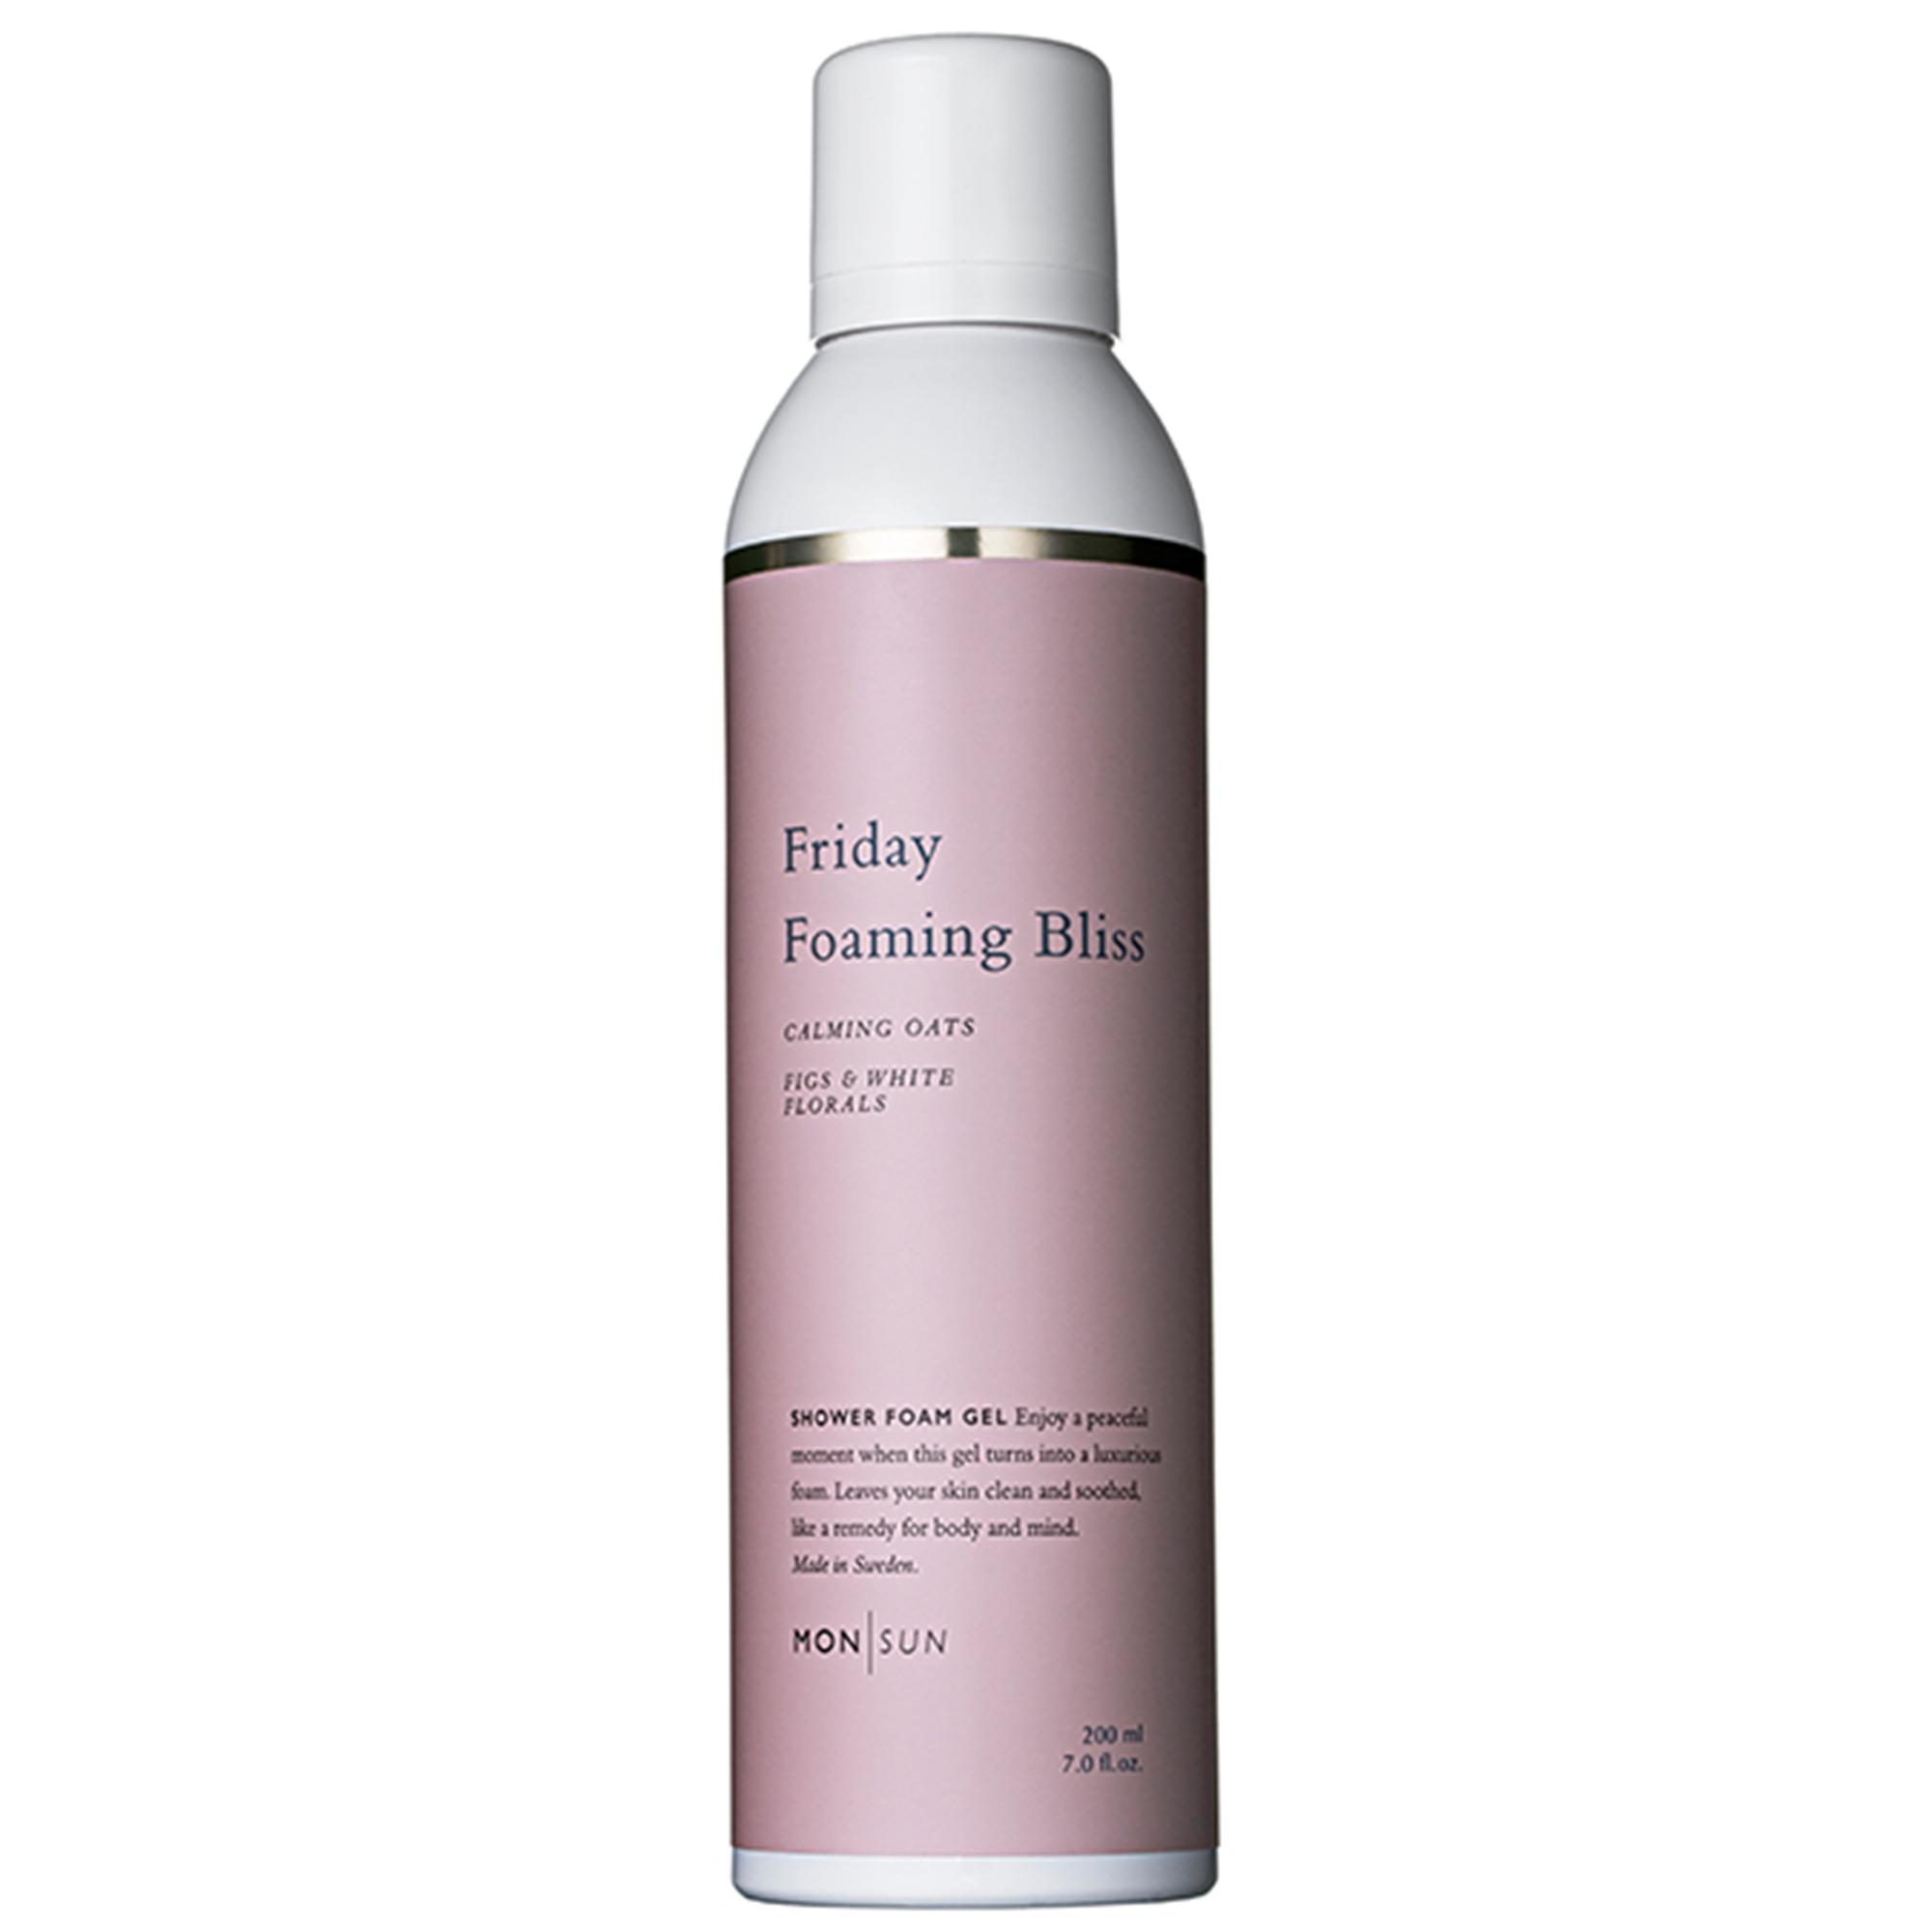 Friday Foaming Bliss Calming Oats Shower Gel 200ml